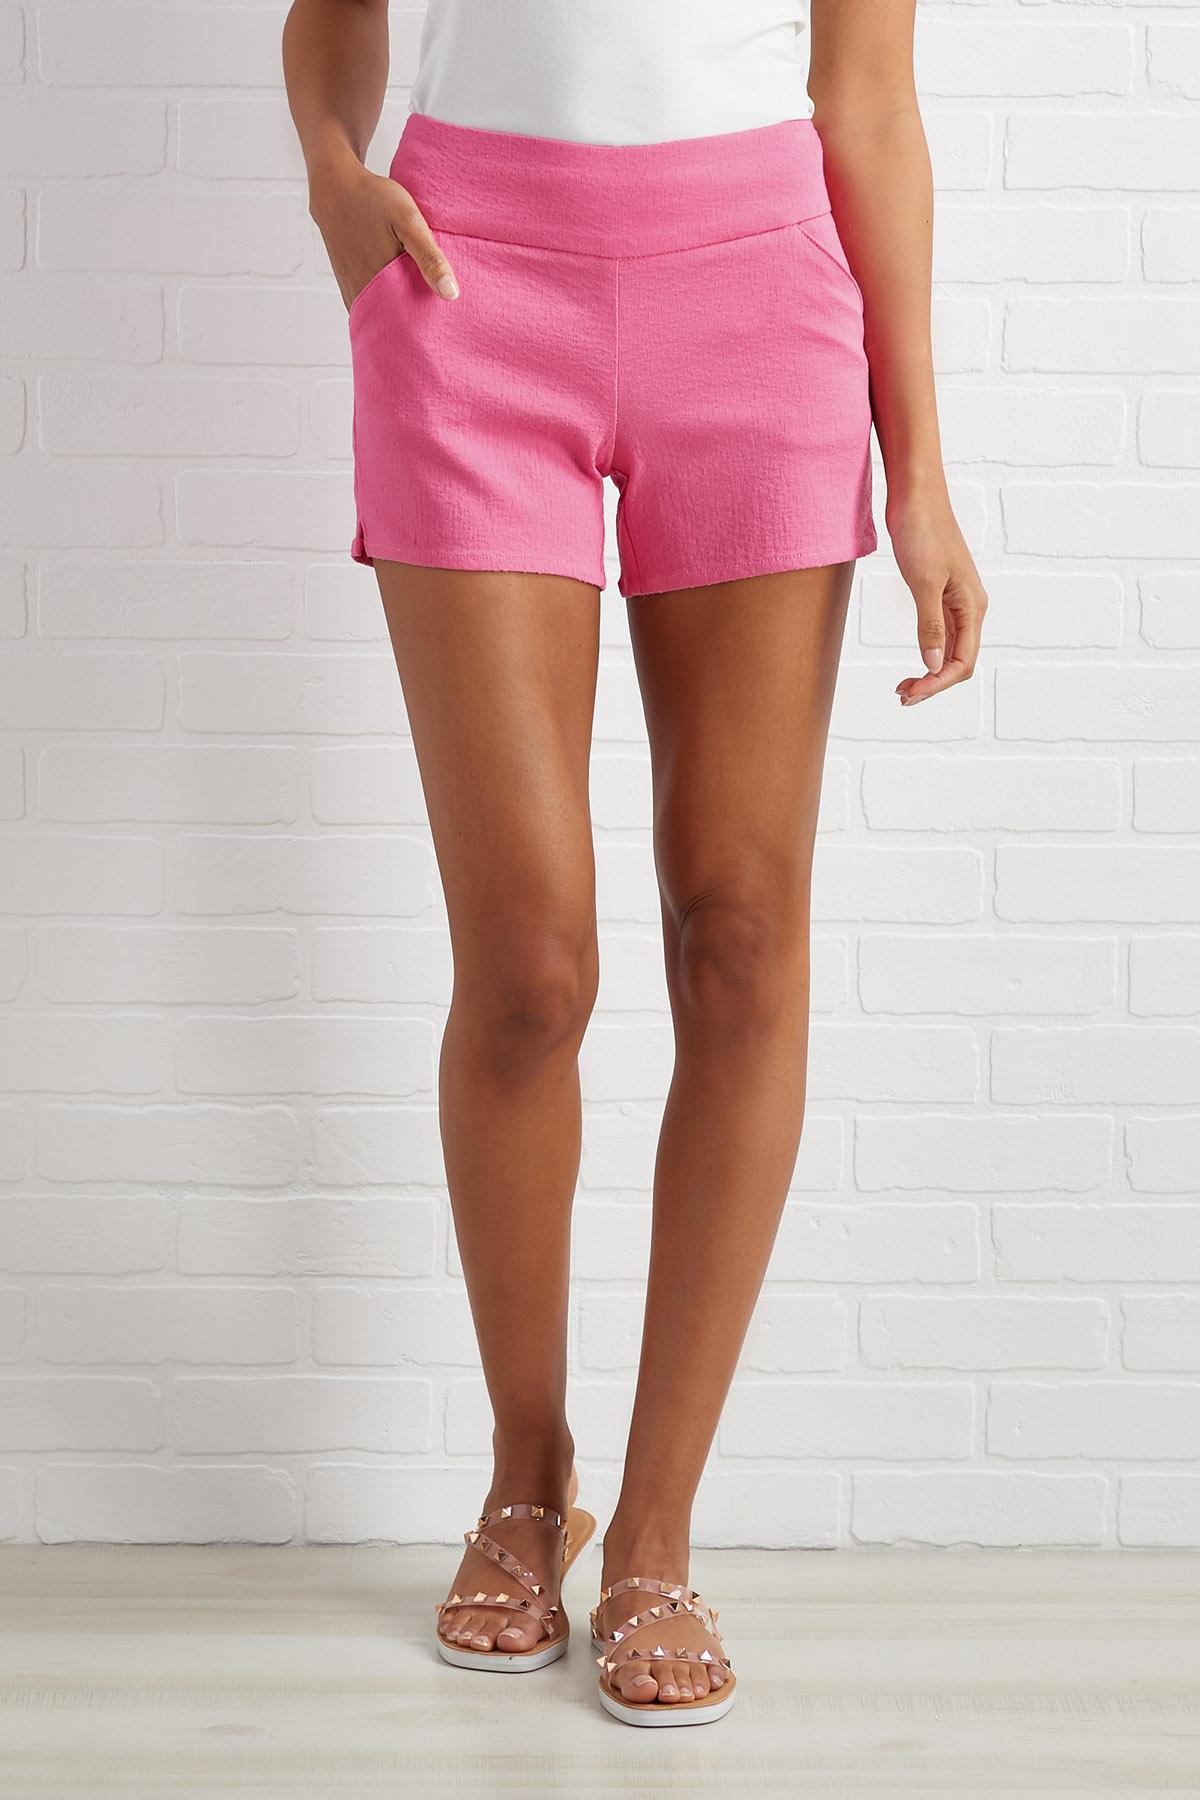 Let's Flamingle Shorts